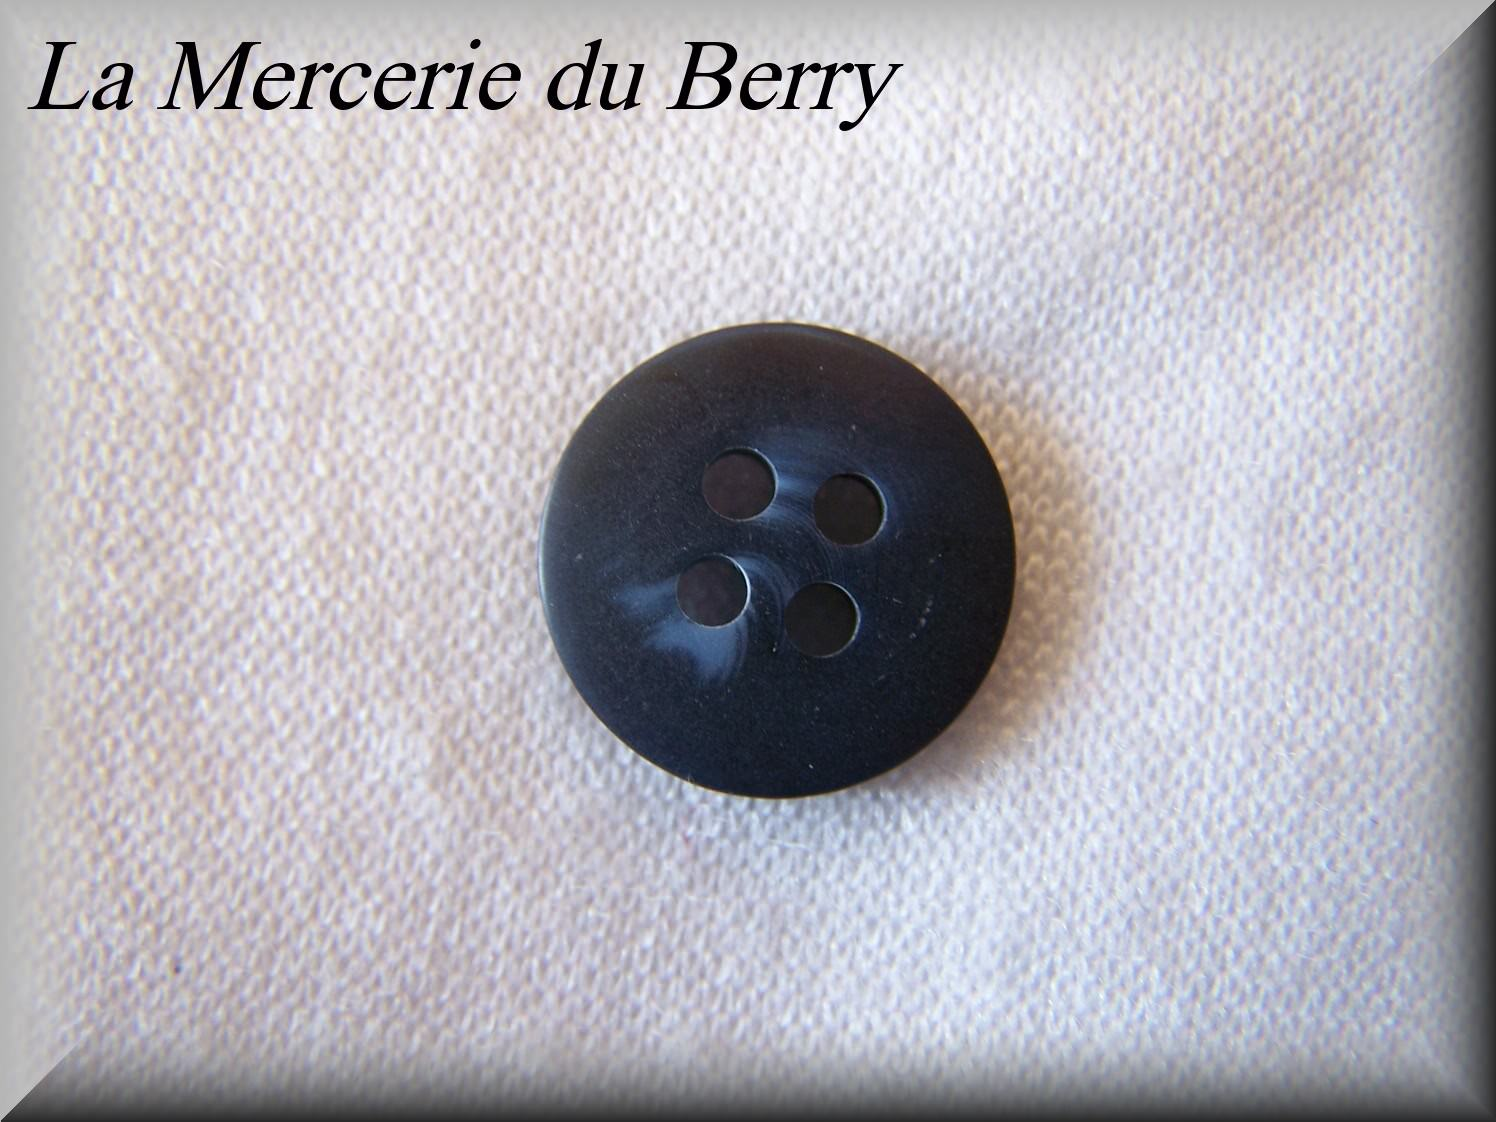 Bouton bleu marine marbré